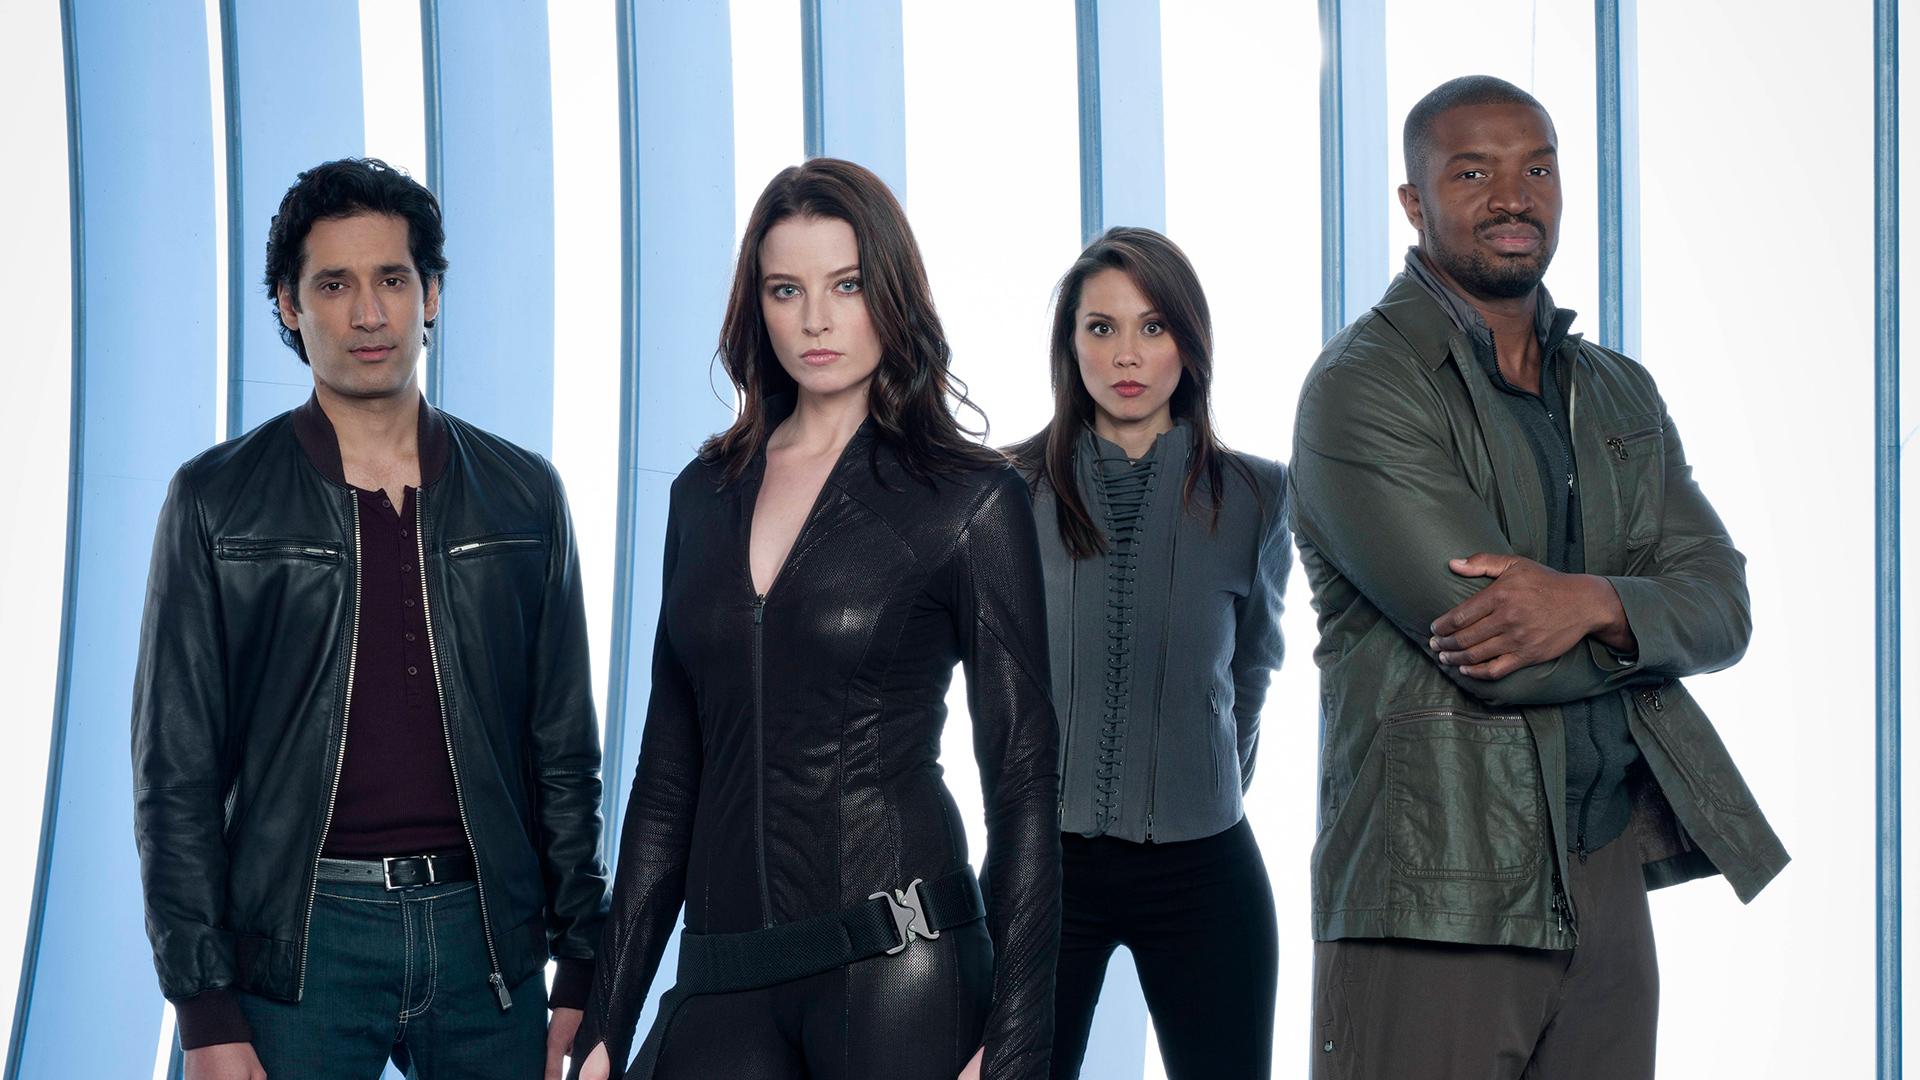 Continuum - Cast, Crew and Credits - TV.com